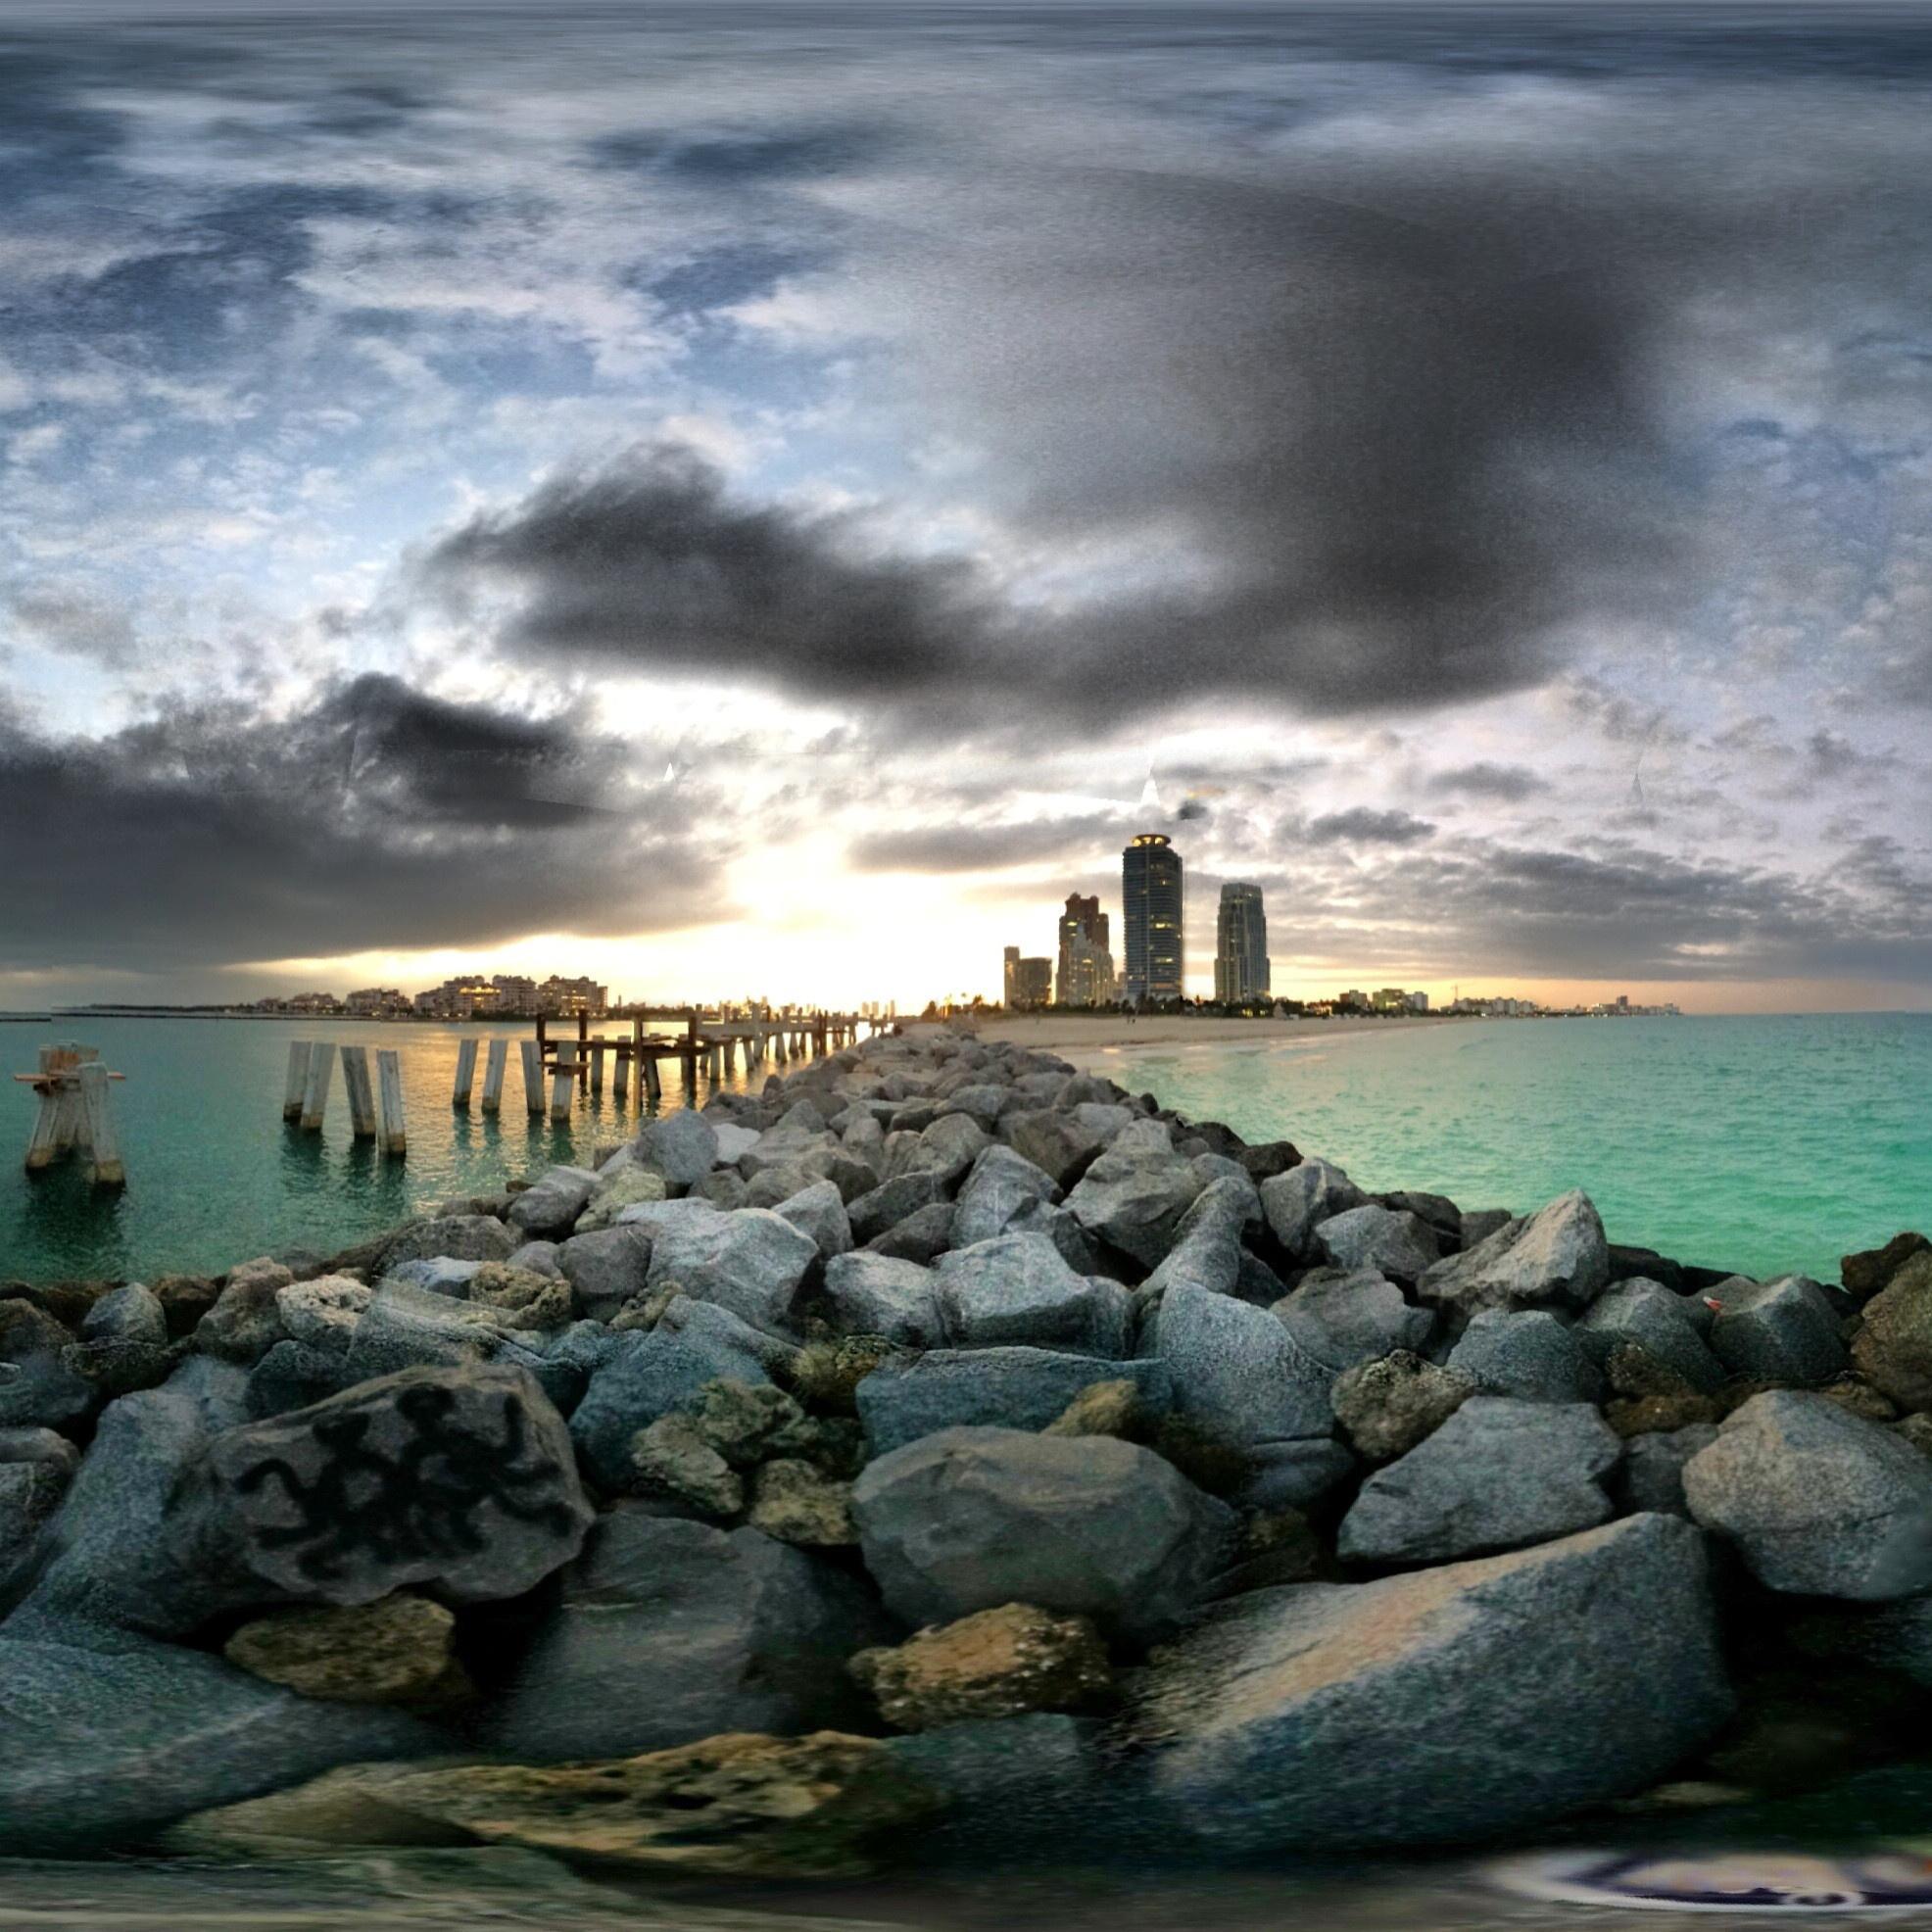 The breakers on Miami Beach.